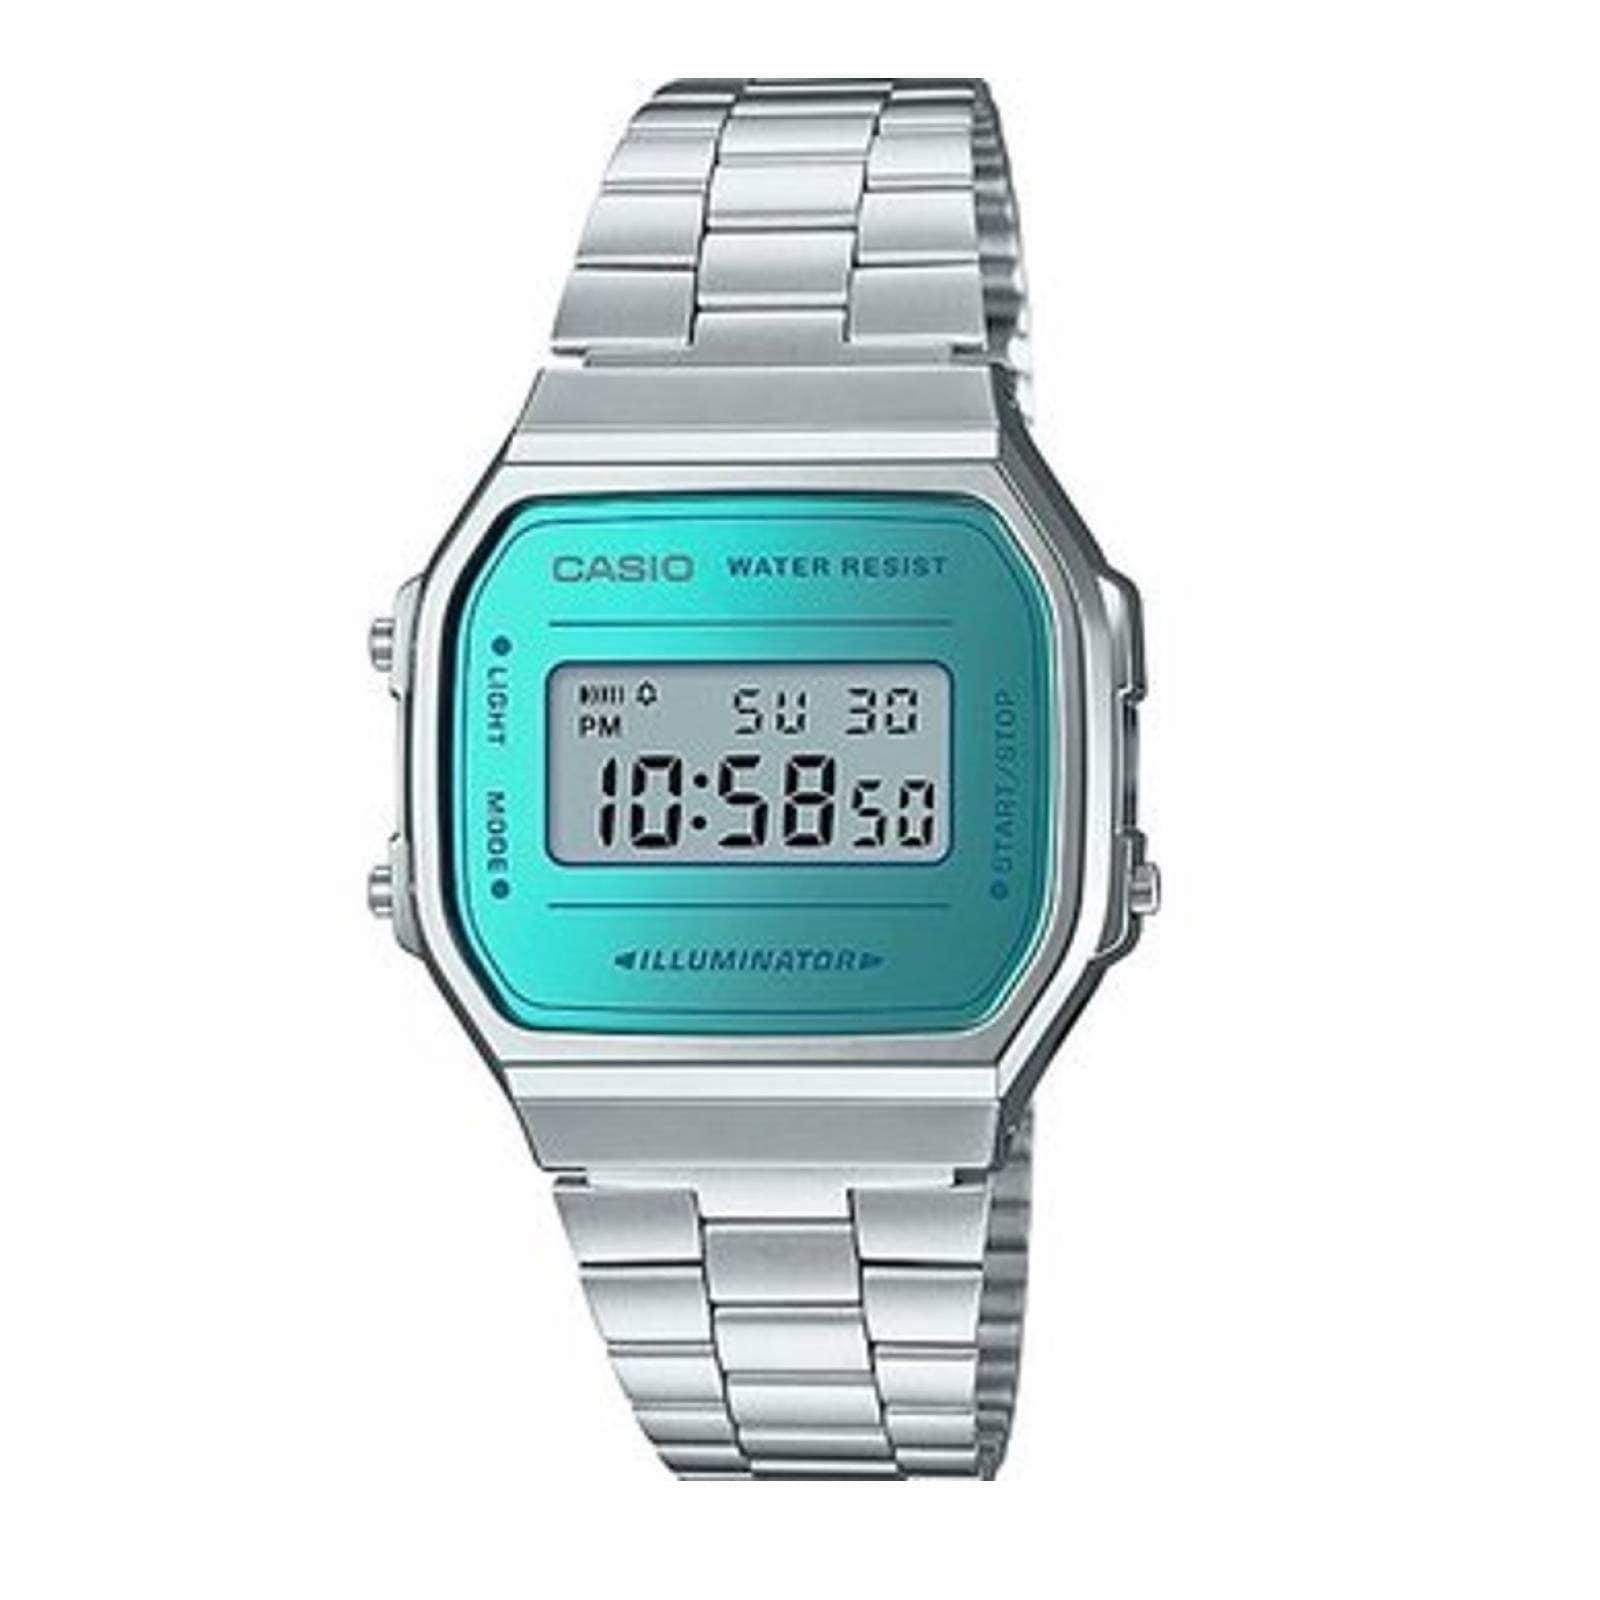 74901c2f2397 Reloj Casio Retro Vintage A168 Plata Espejo Azul- 100% Original Cfmx